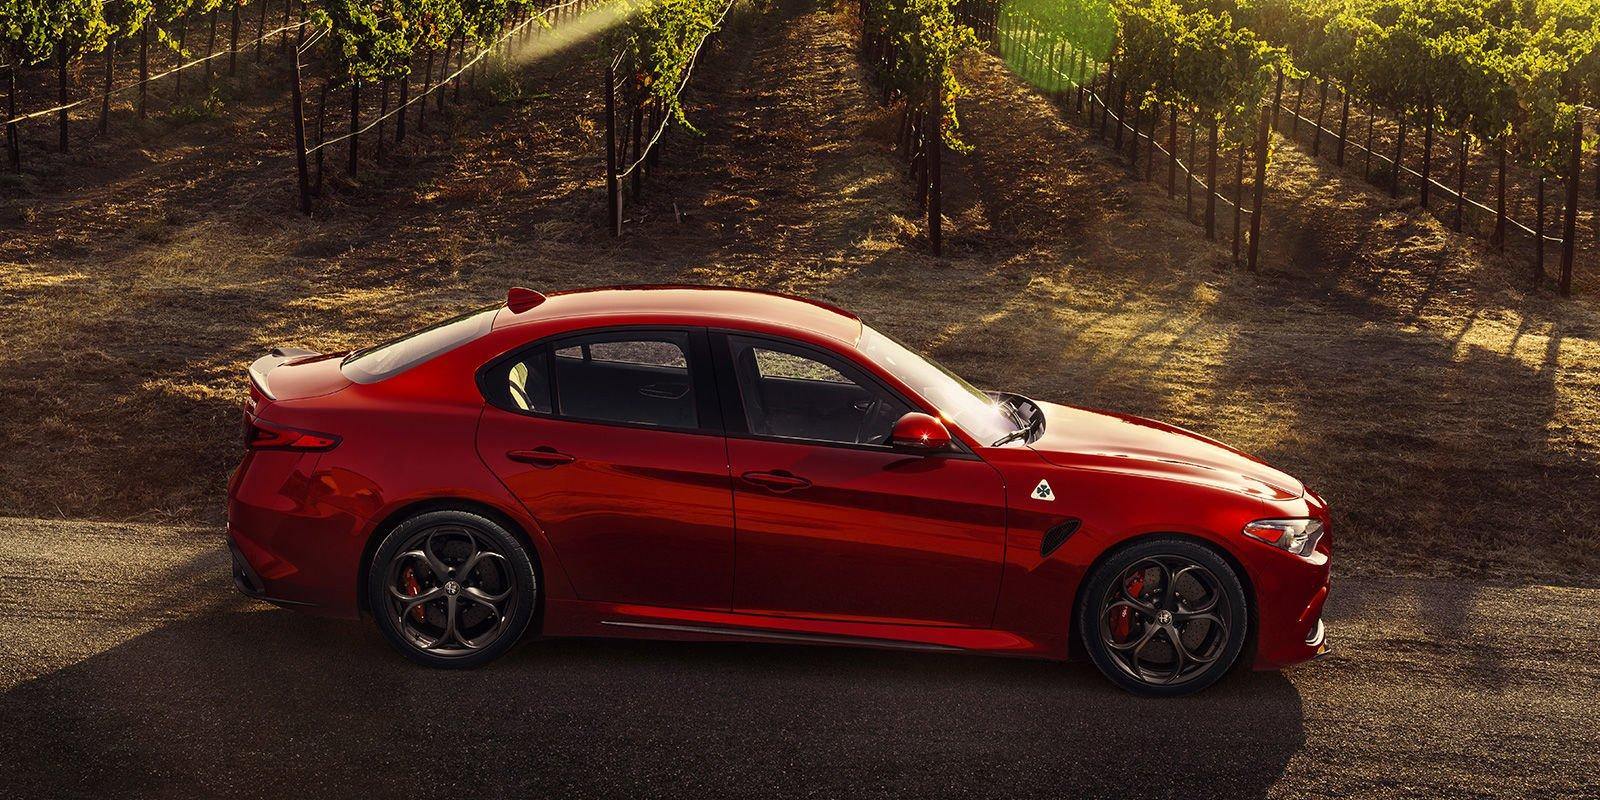 New Alfa Romeo Giulia Quadrifoglio Buy Lease And Finance Offers Msrp On Sale Near Danvers Ma